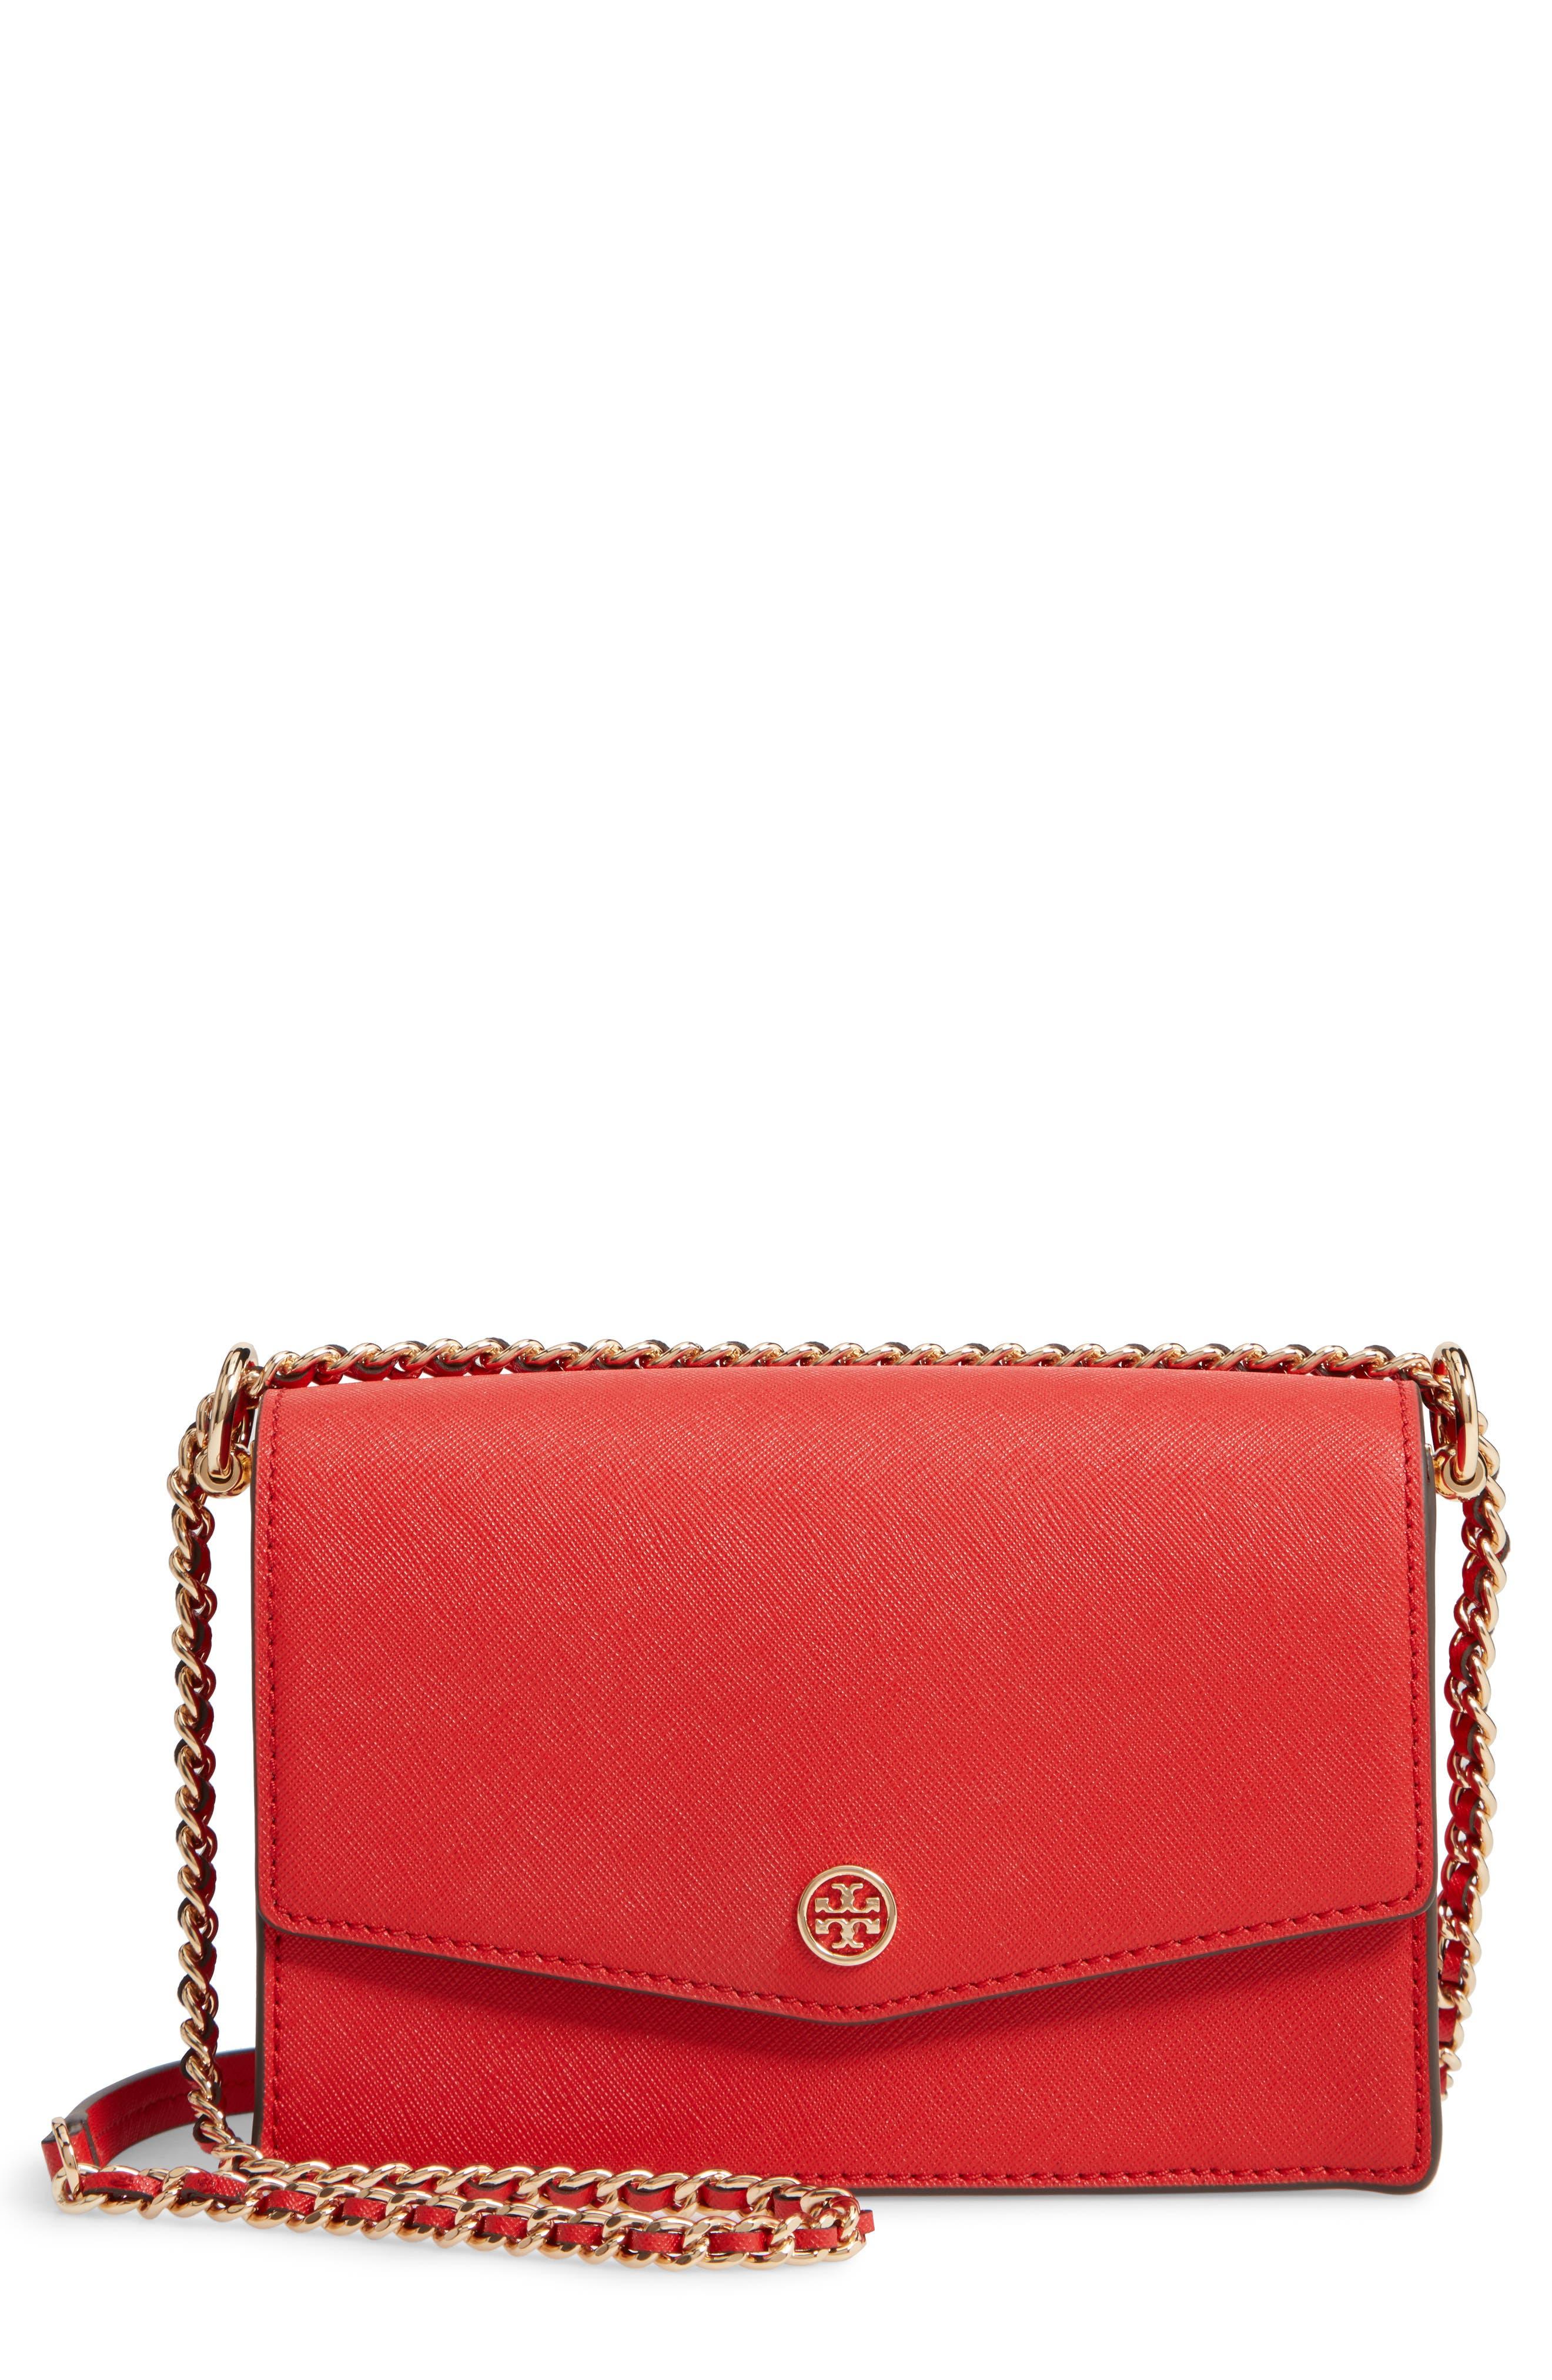 Mini Robinson Convertible Leather Shoulder Bag,                             Main thumbnail 1, color,                             BRILLIANT RED